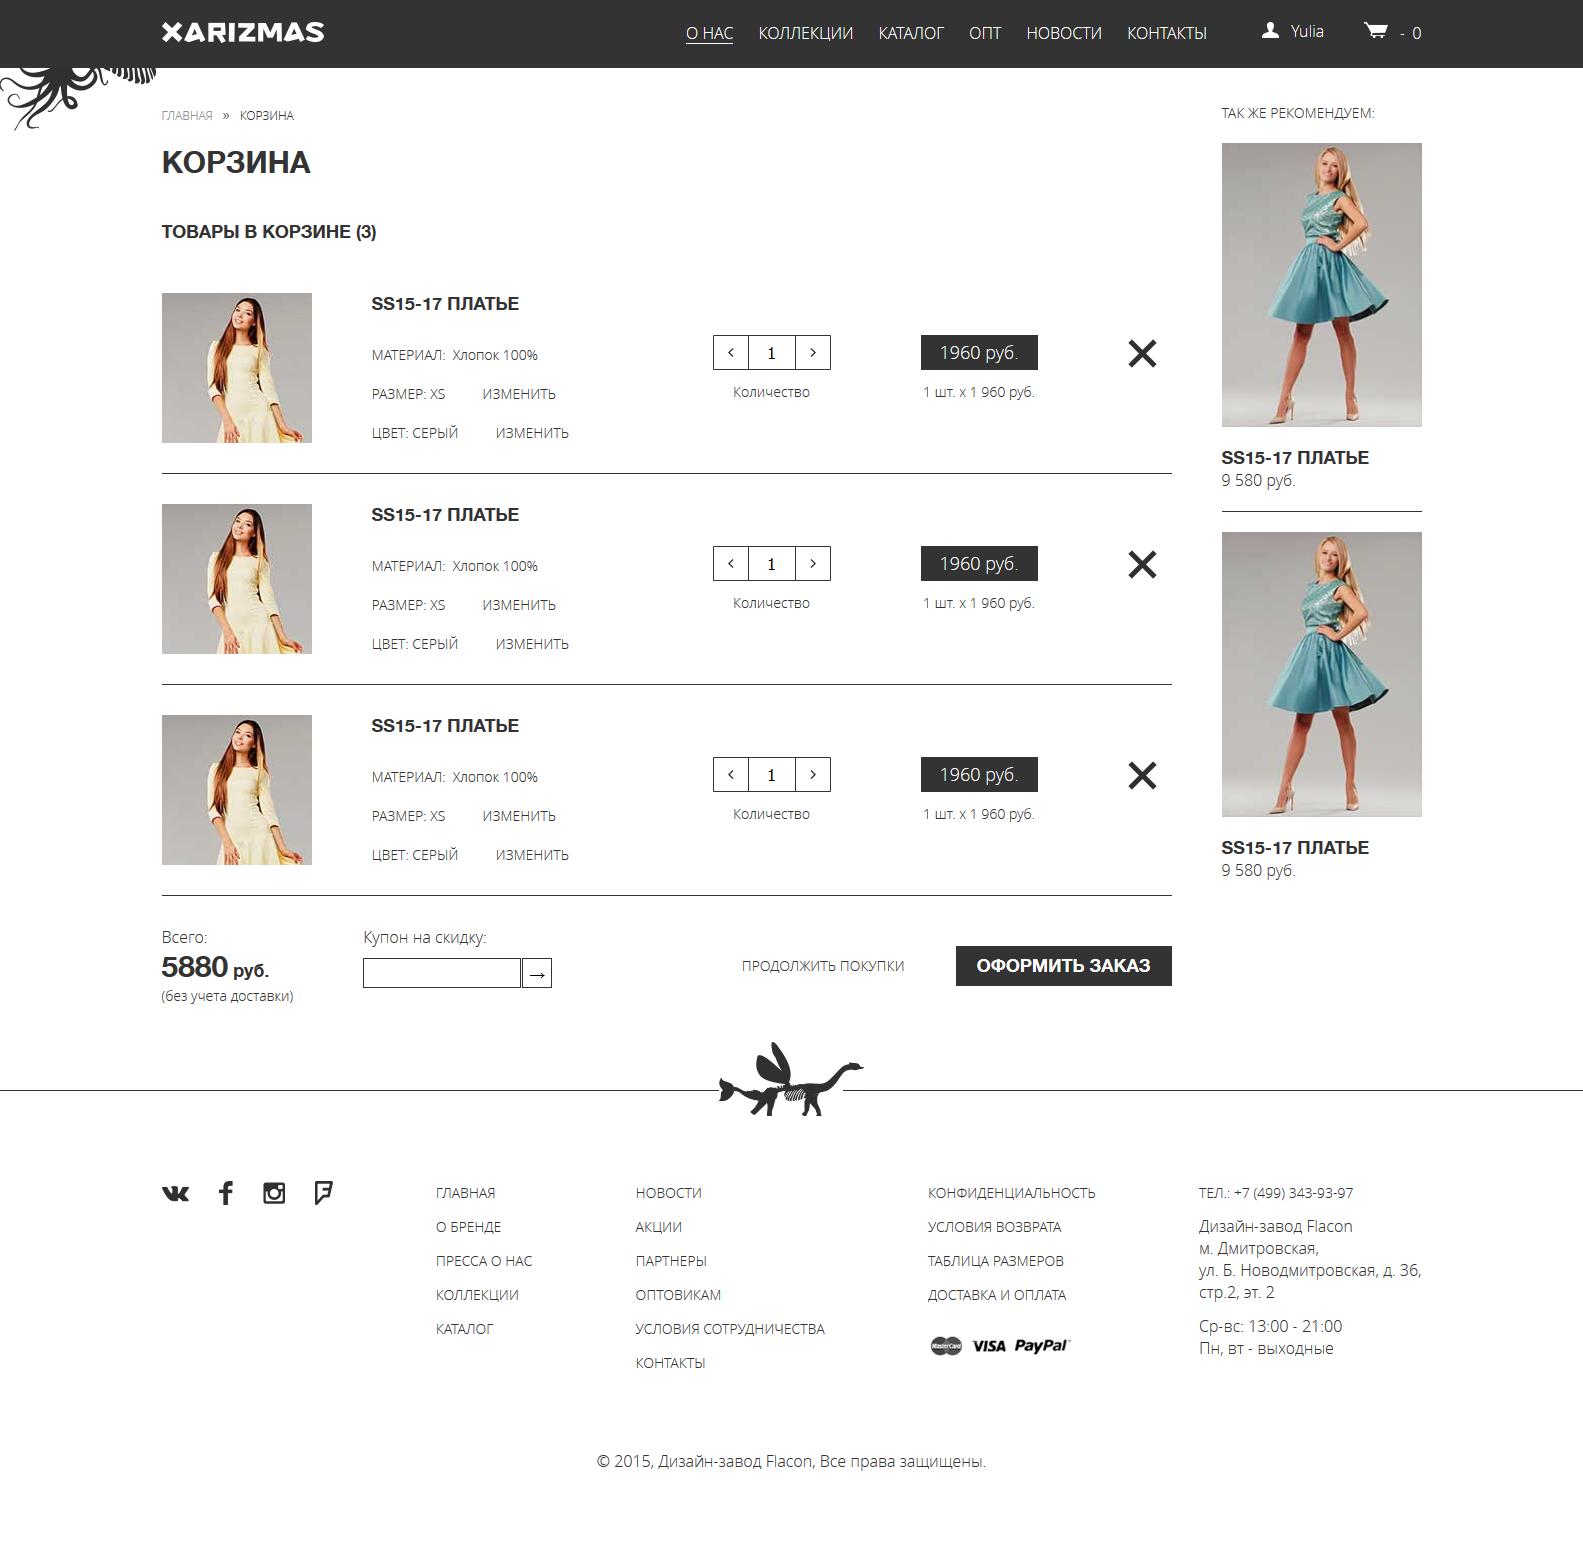 Xarizmas - интернет-магазин